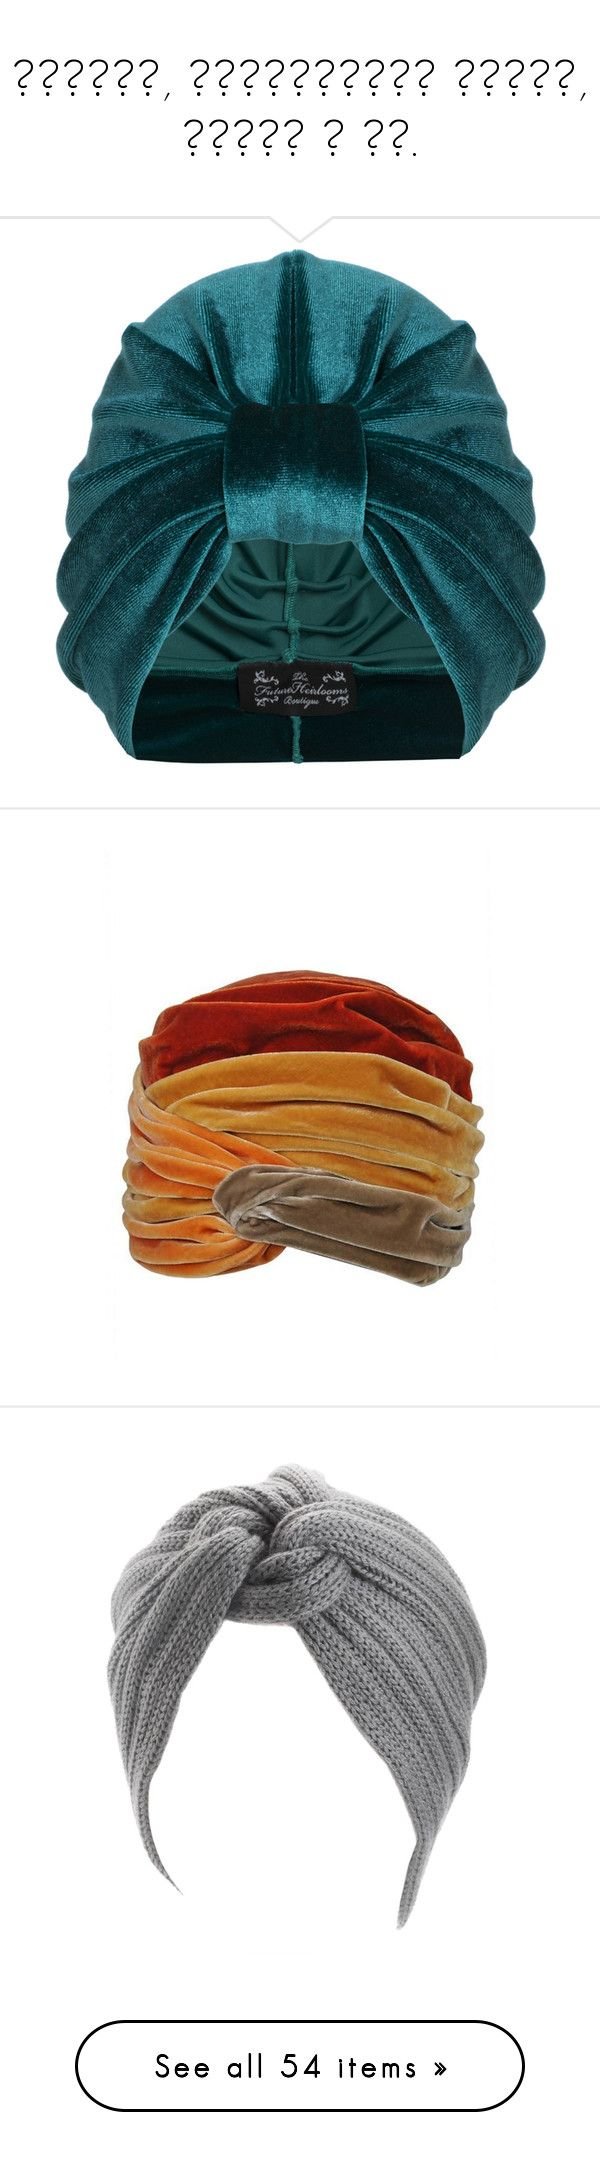 """Тюрбан, ковбойская шляпа, кепка и др."" by klukina-mv ❤ liked on Polyvore featuring accessories, hats, blue, blue hat, velvet hat, teal hat, turban hat, blue turban, orange and orange hat"